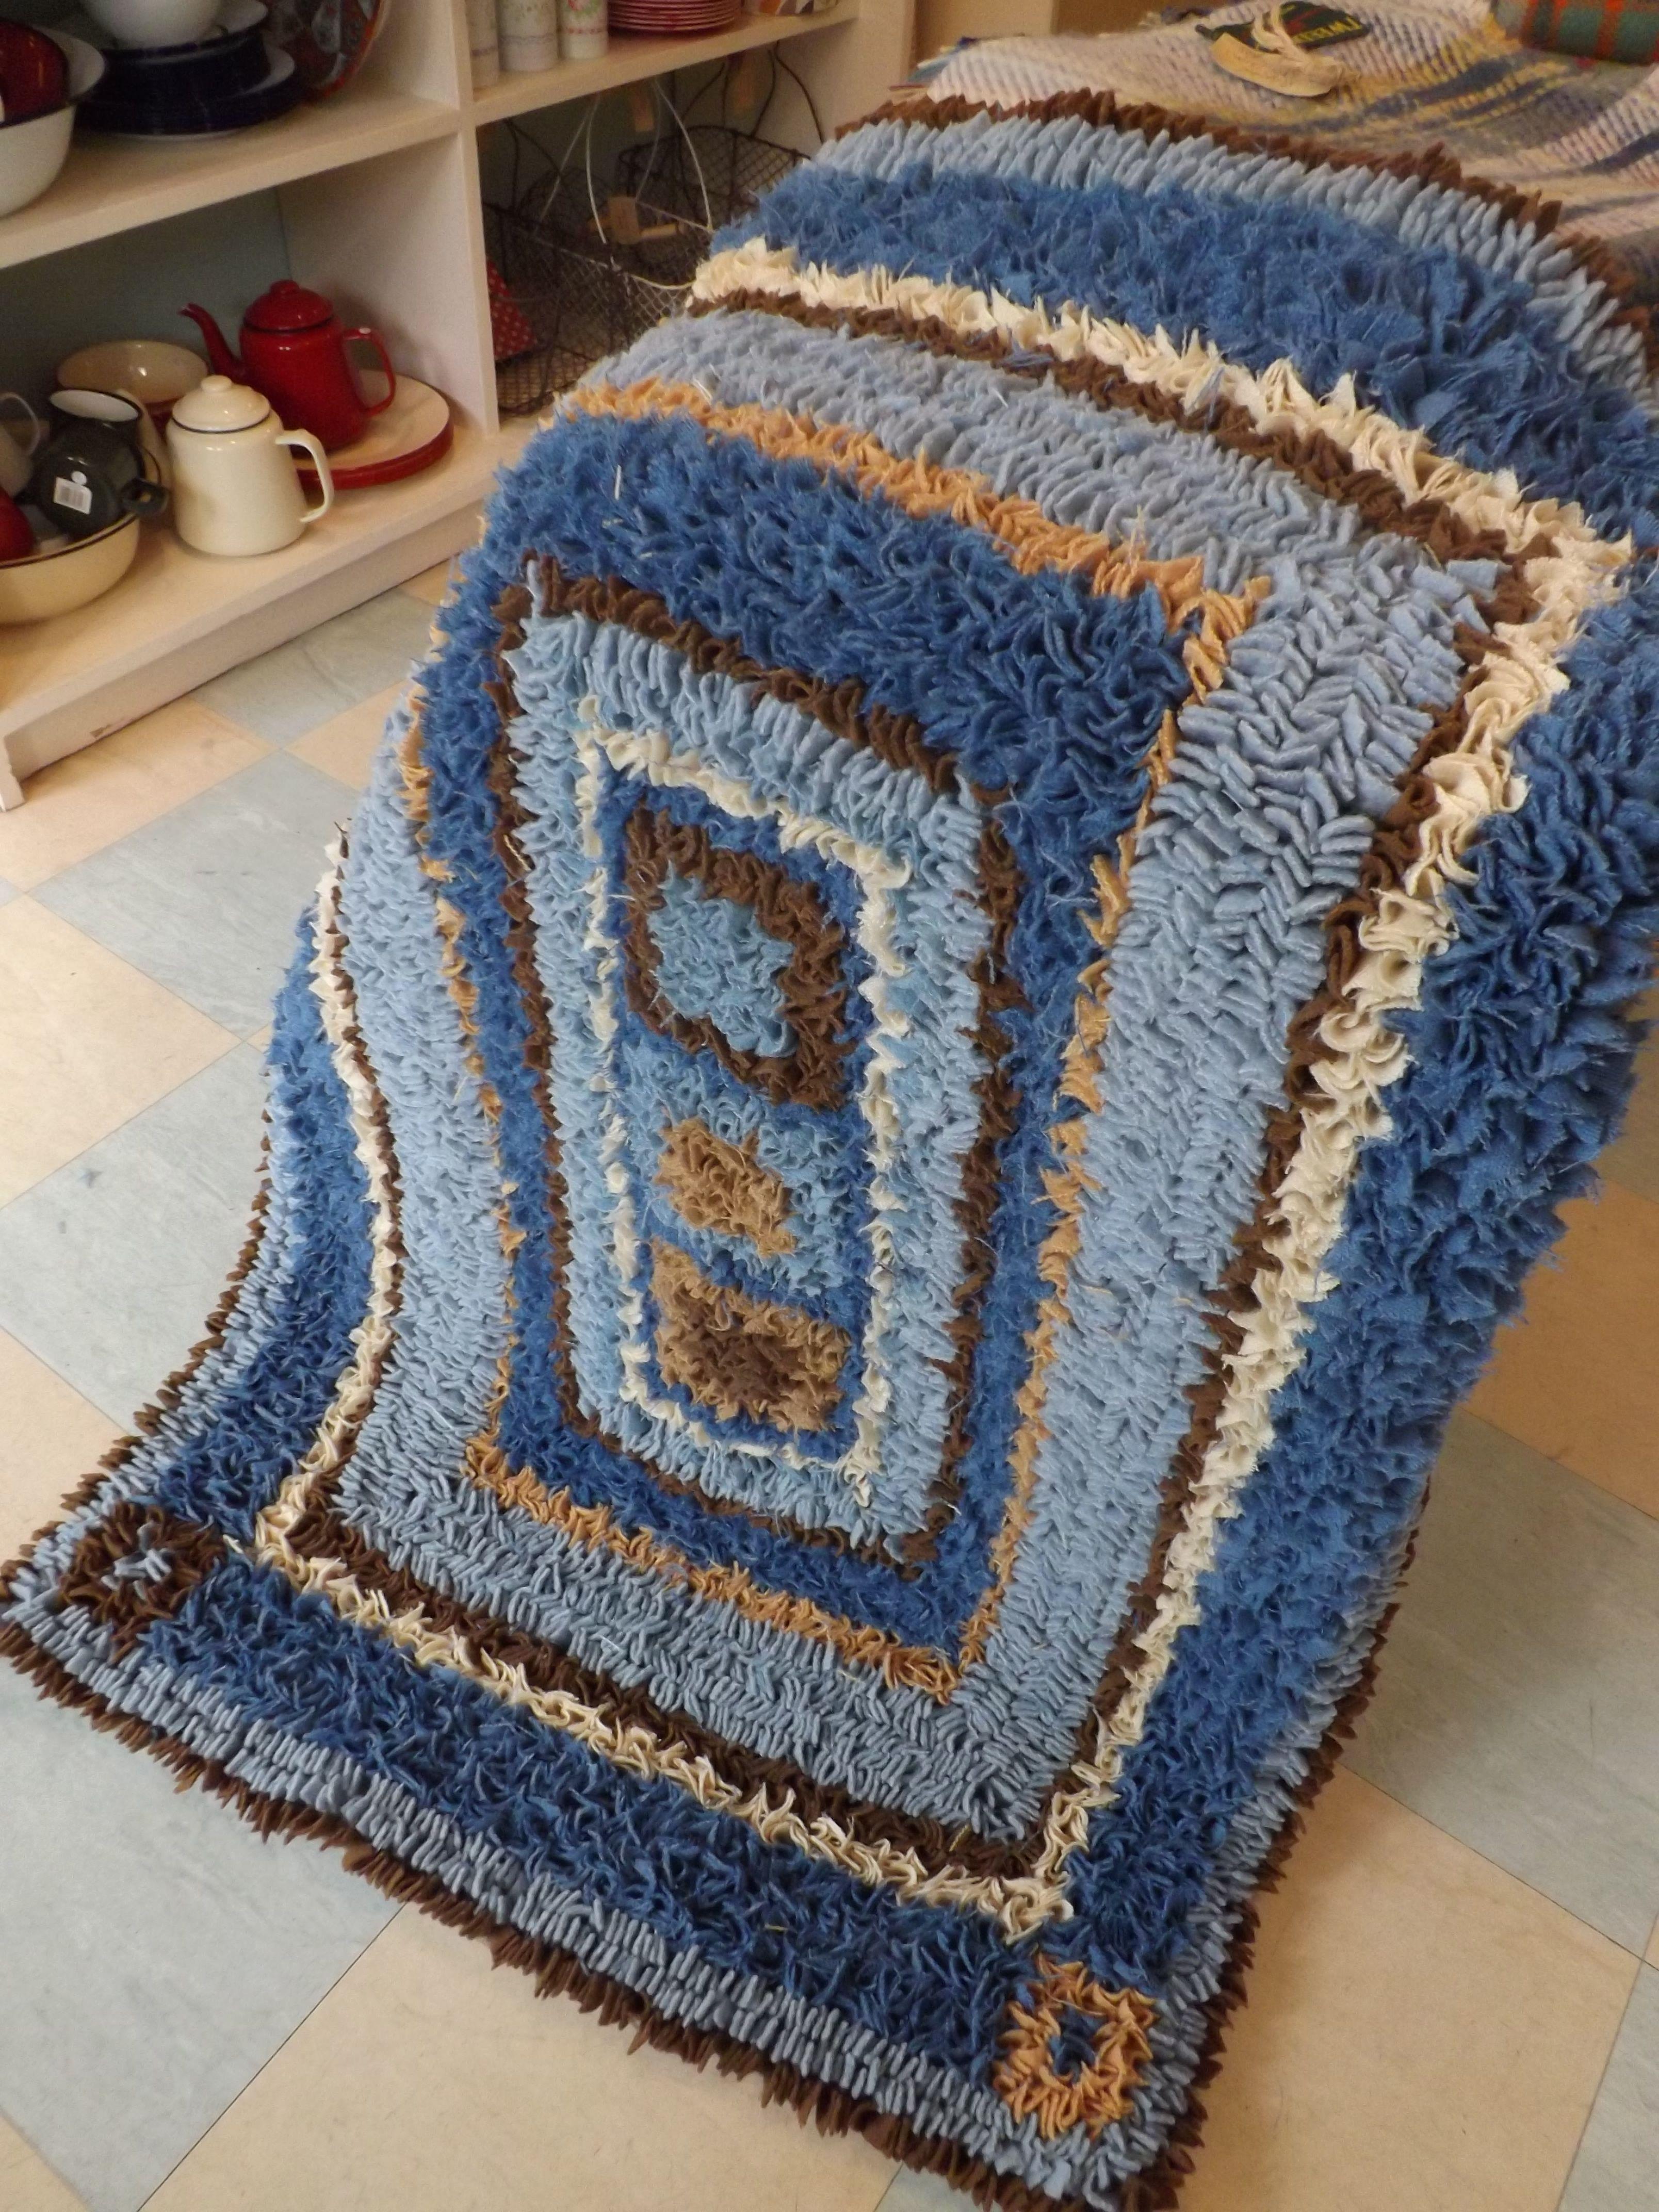 Old Woollen Blankets Rag Rug Hearth